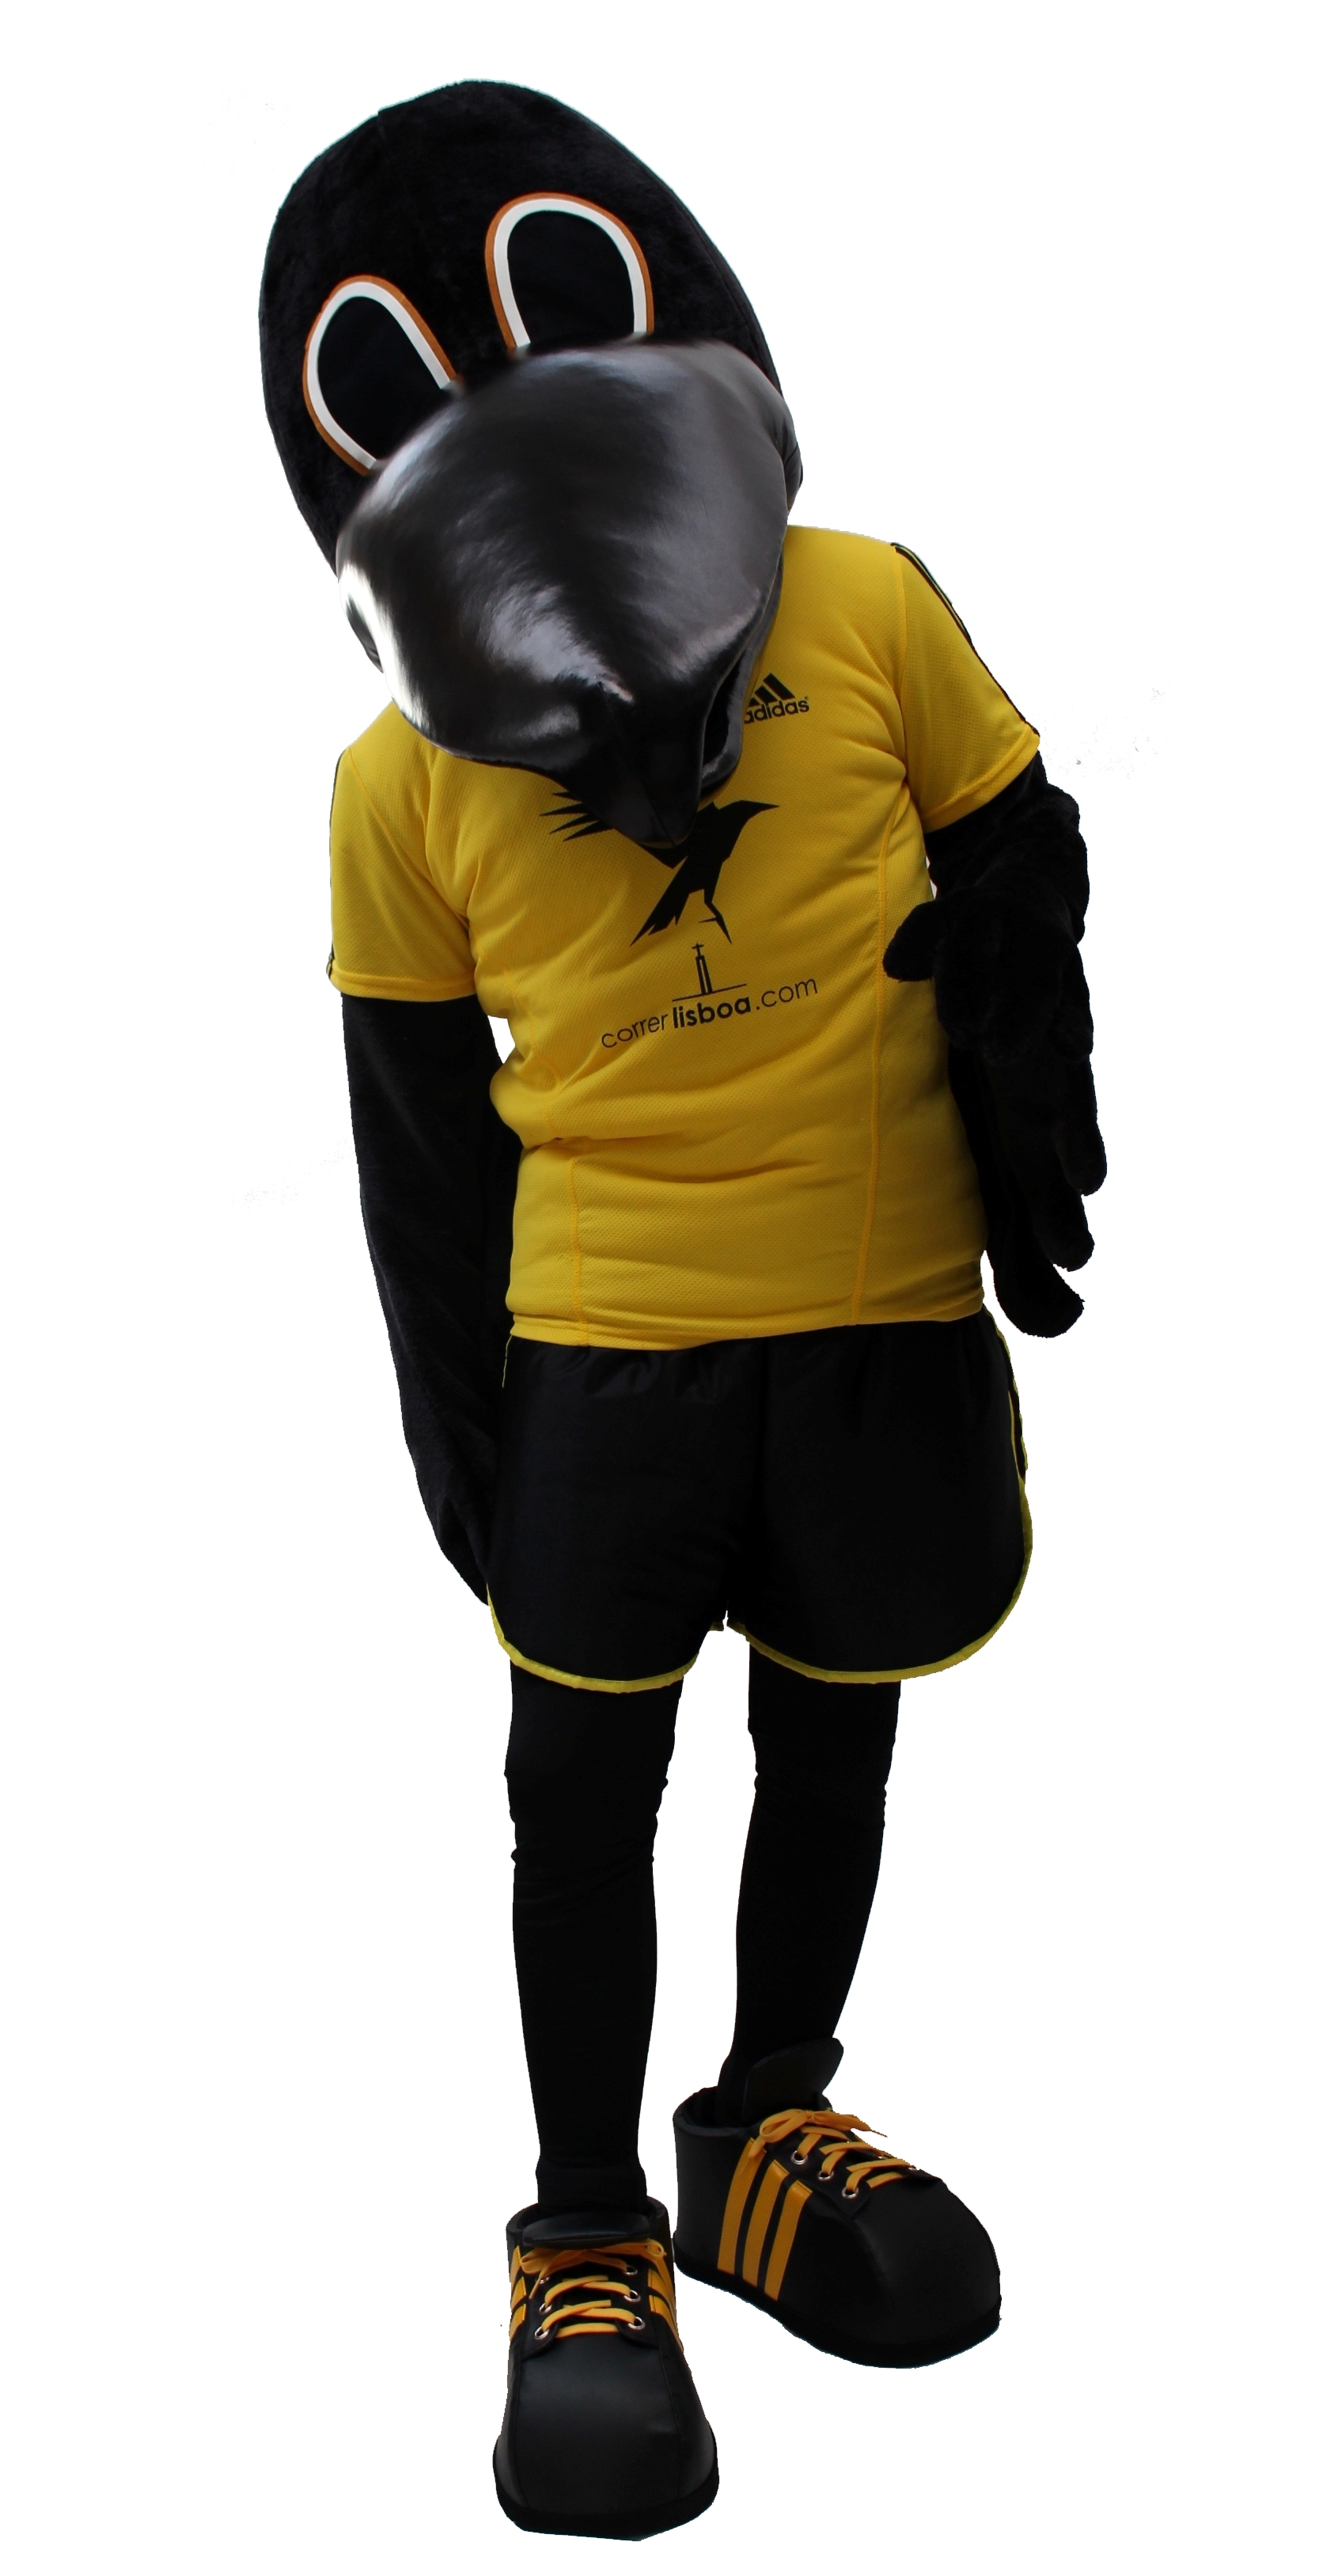 Mascote Partyval corvo correr lisboa